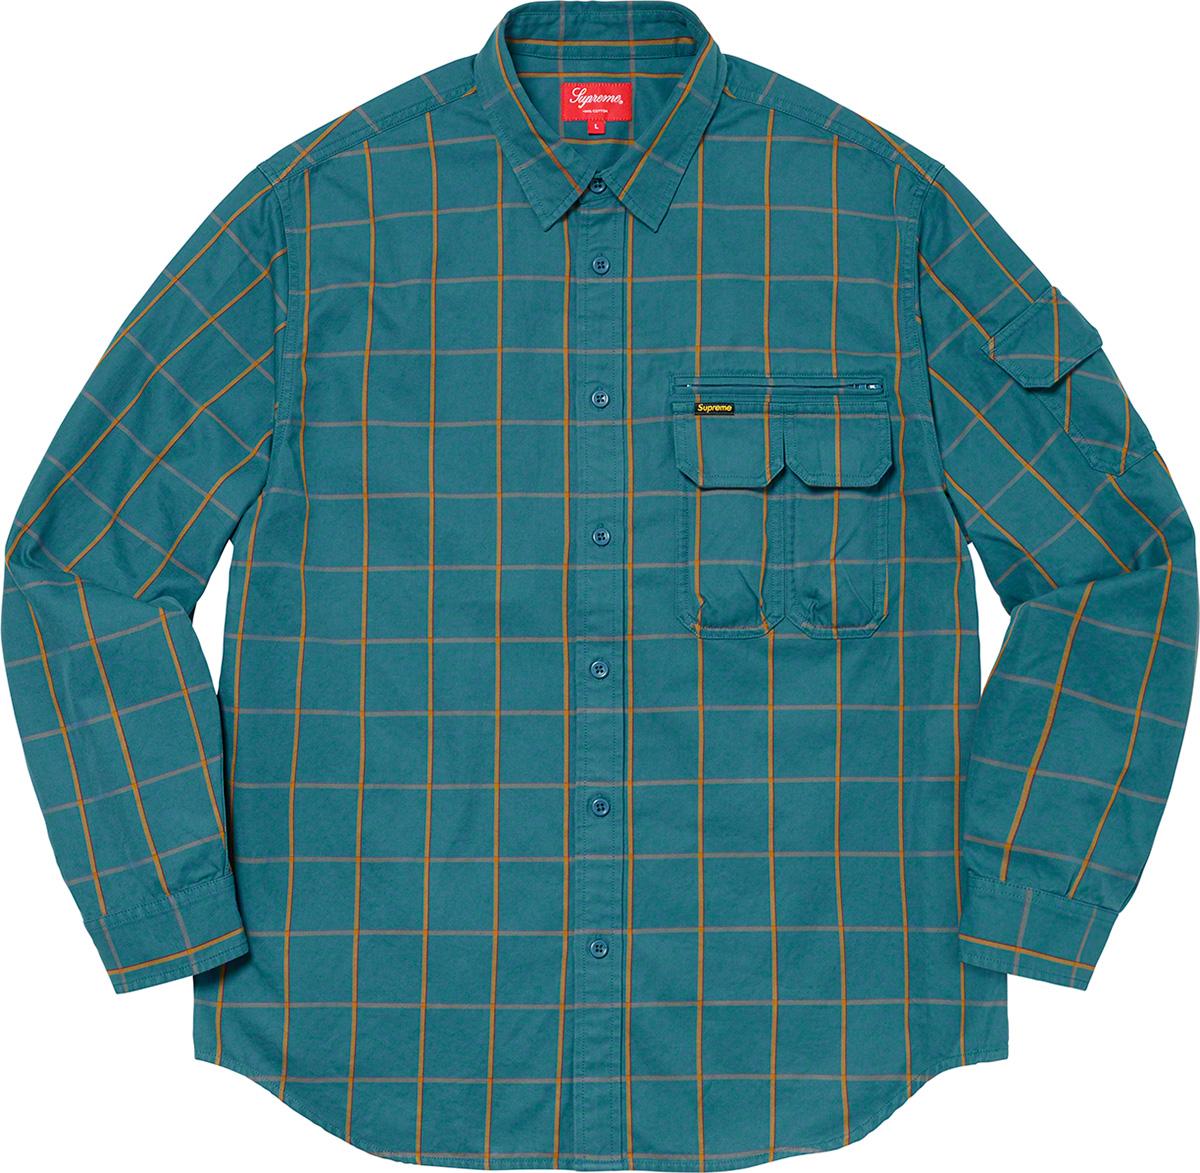 Supreme 2020fw Twill Multi Pocket Shirt シュプリーム マルチ ポケット シャツ ブルー